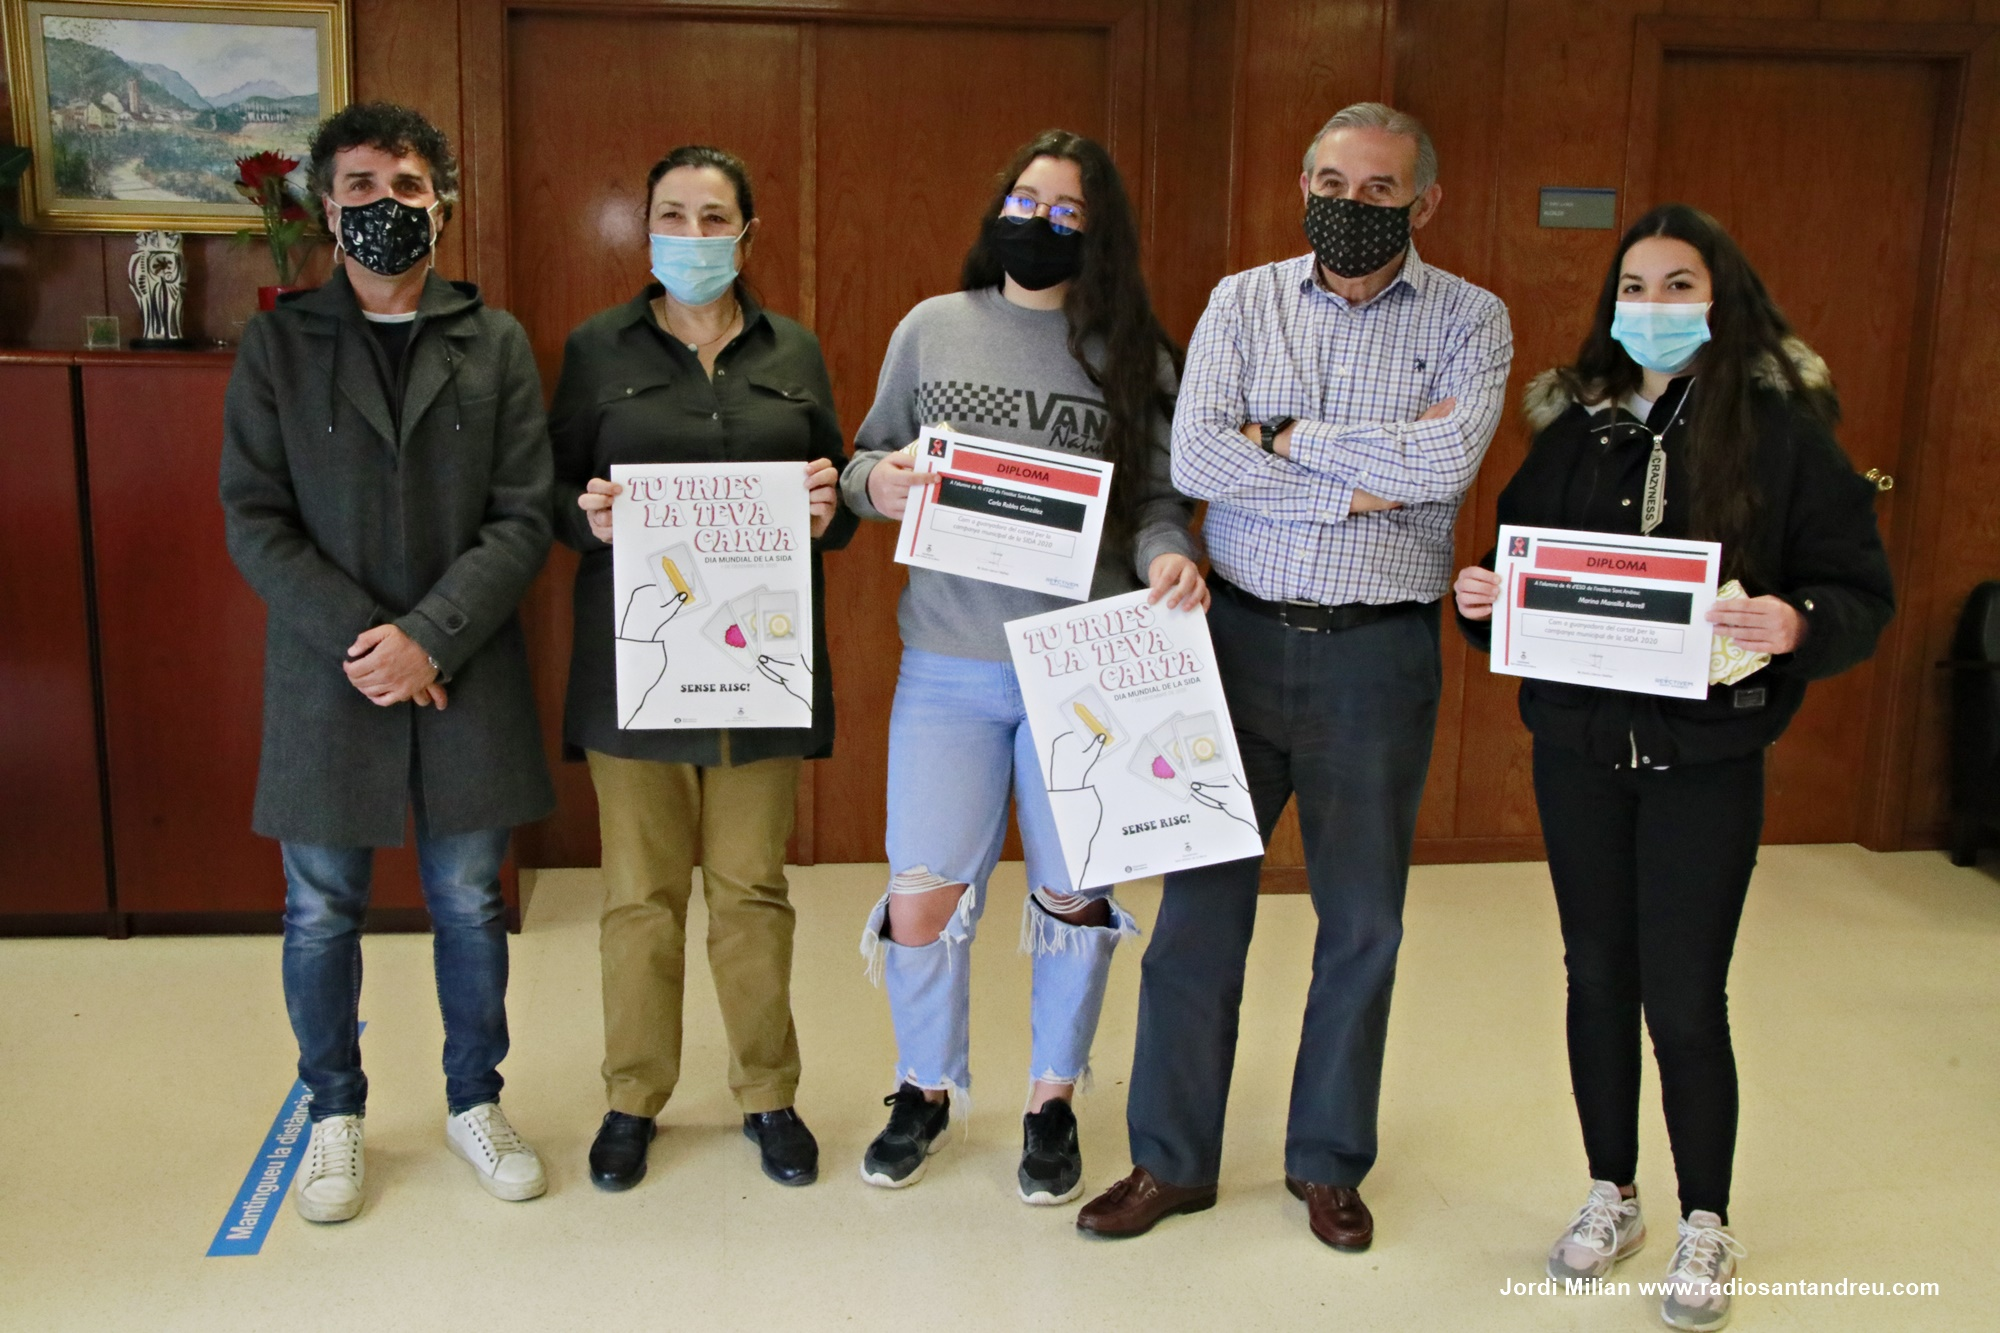 Lliurament premi cartell Dia Mundial Sida